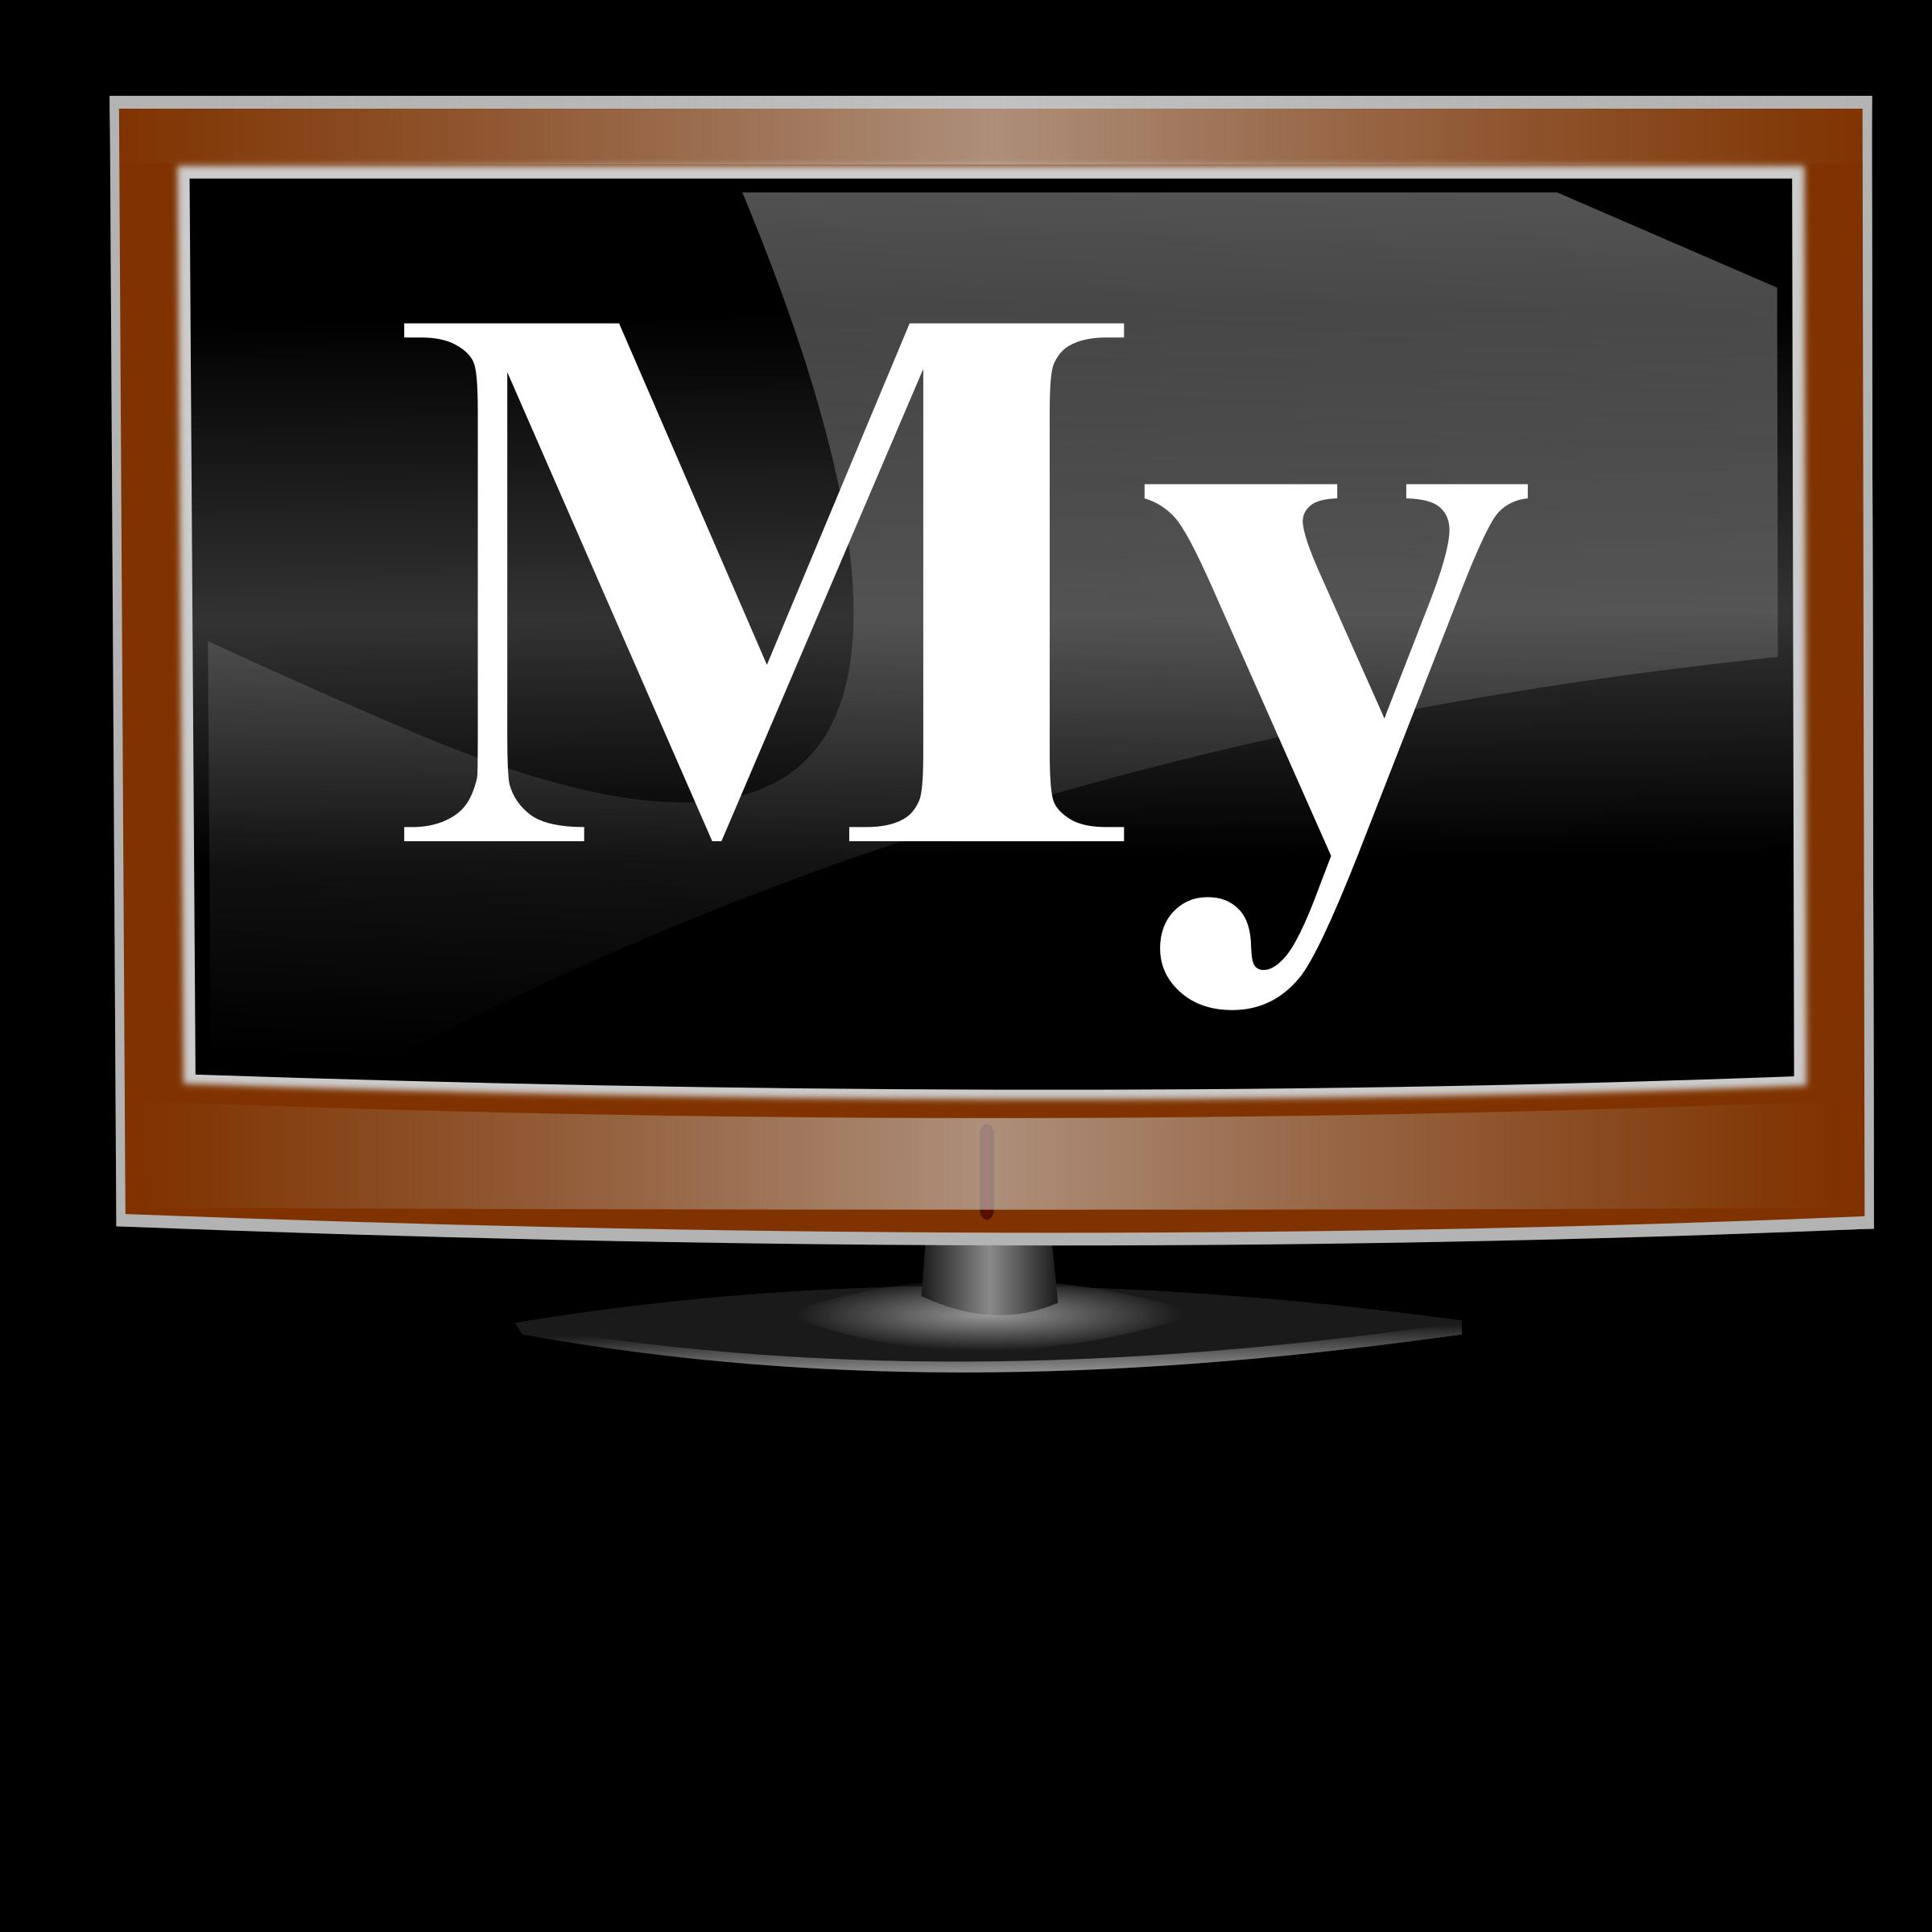 My big image png. Computer clipart logo